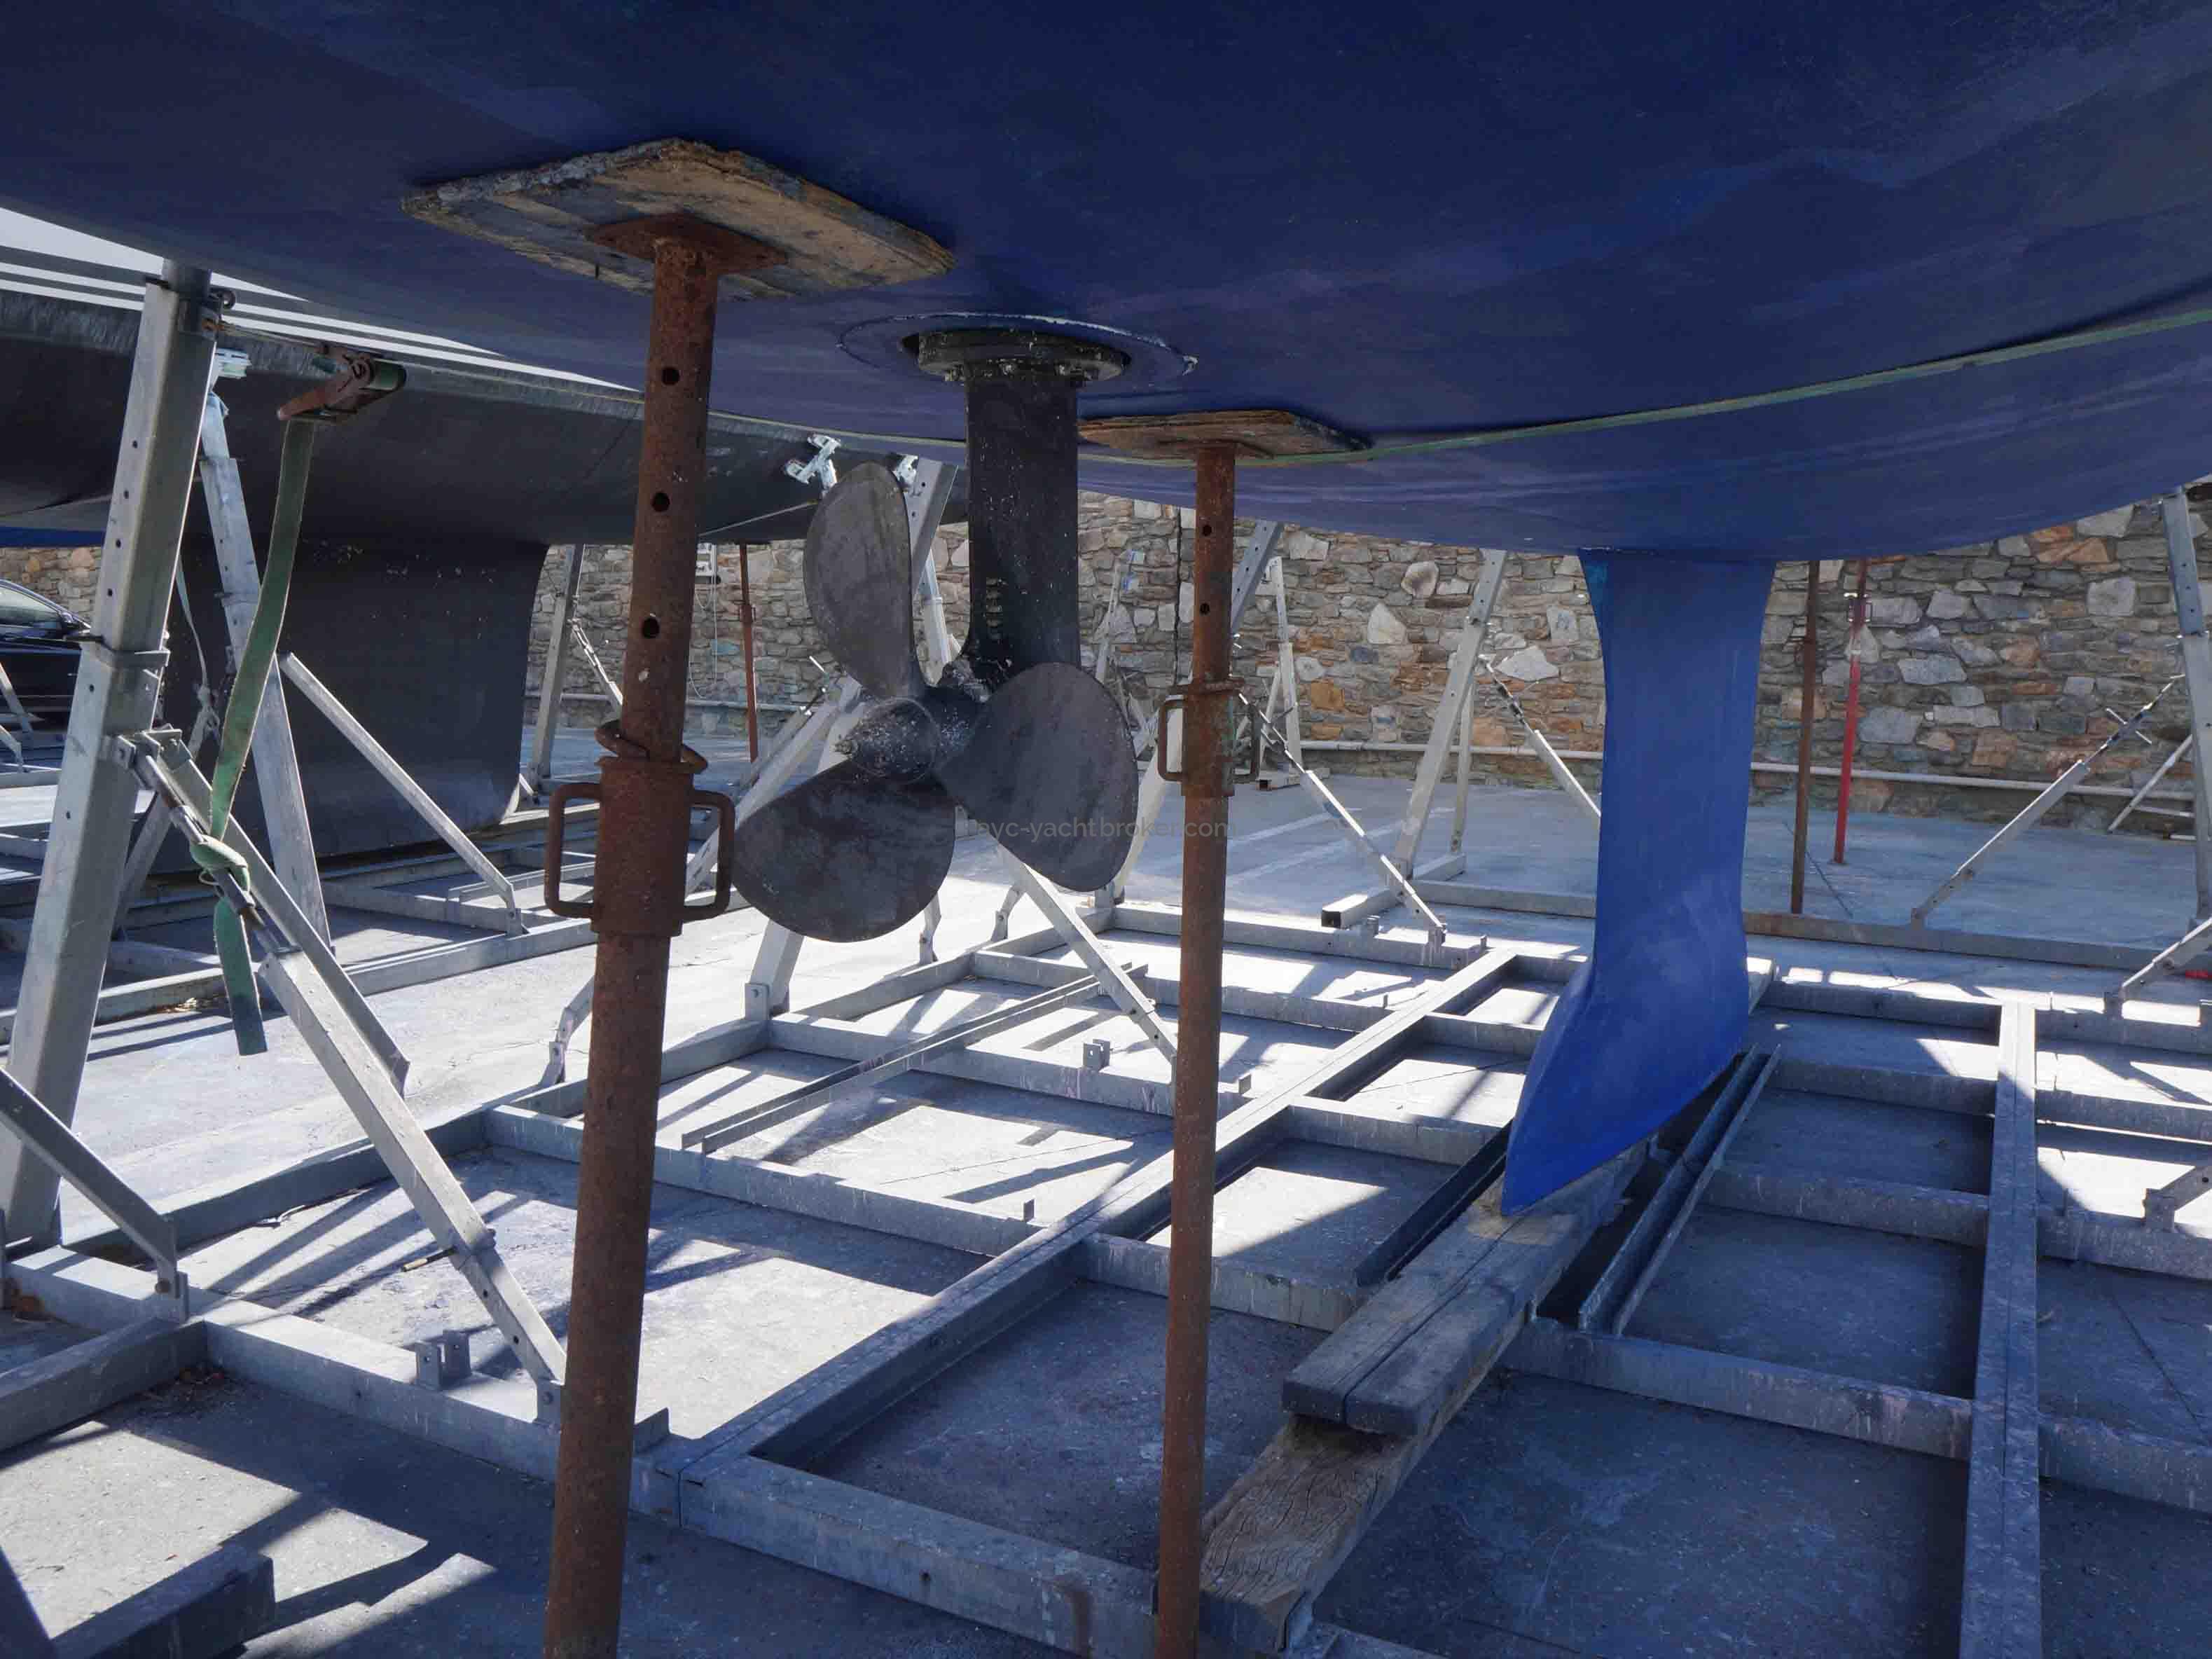 OCEANIS 55 - AYC International Yachtbrokers - Profilé de la coque